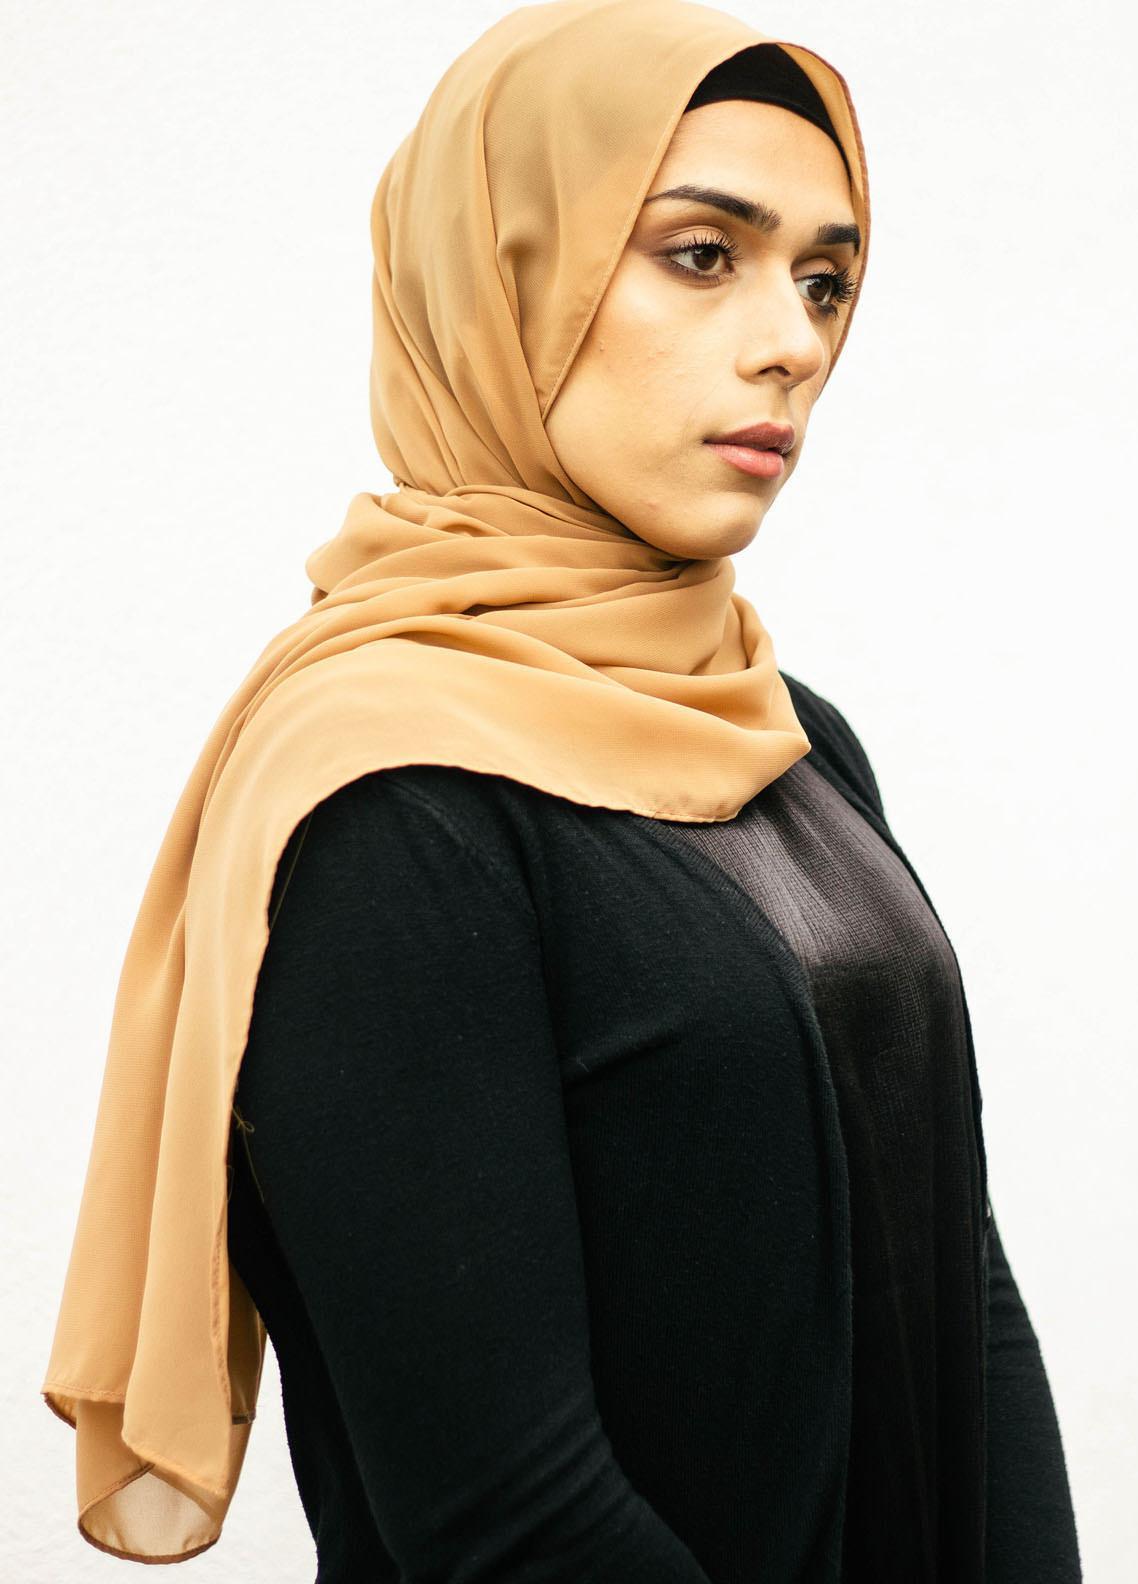 Nida Gul Printed Chiffon Hijab NG20MDH H-101 Luxury Butter Chiffon Hijab Toffee